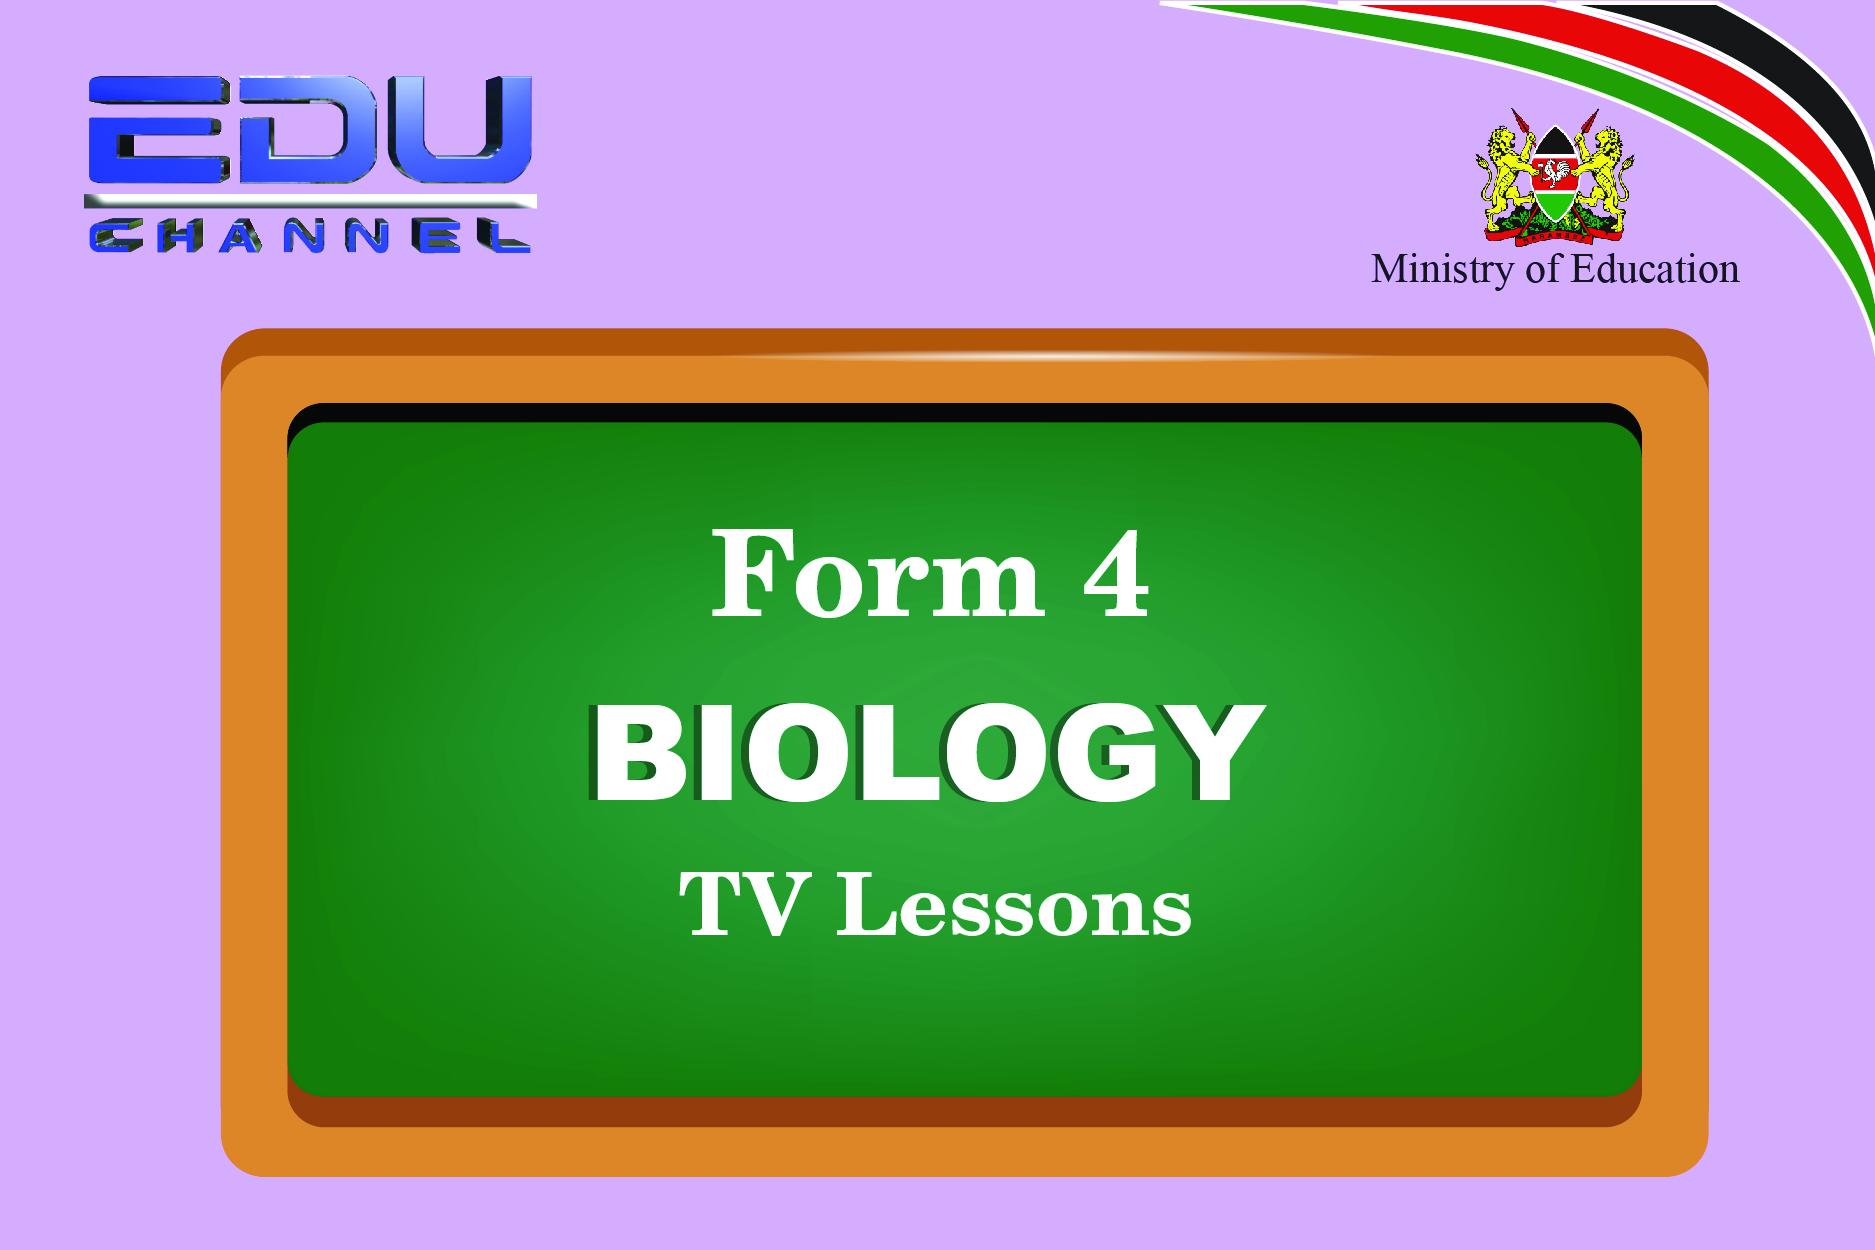 Form 4 Biology Lesson 12: Reception response and Coordination of Organisms - Sense Organs